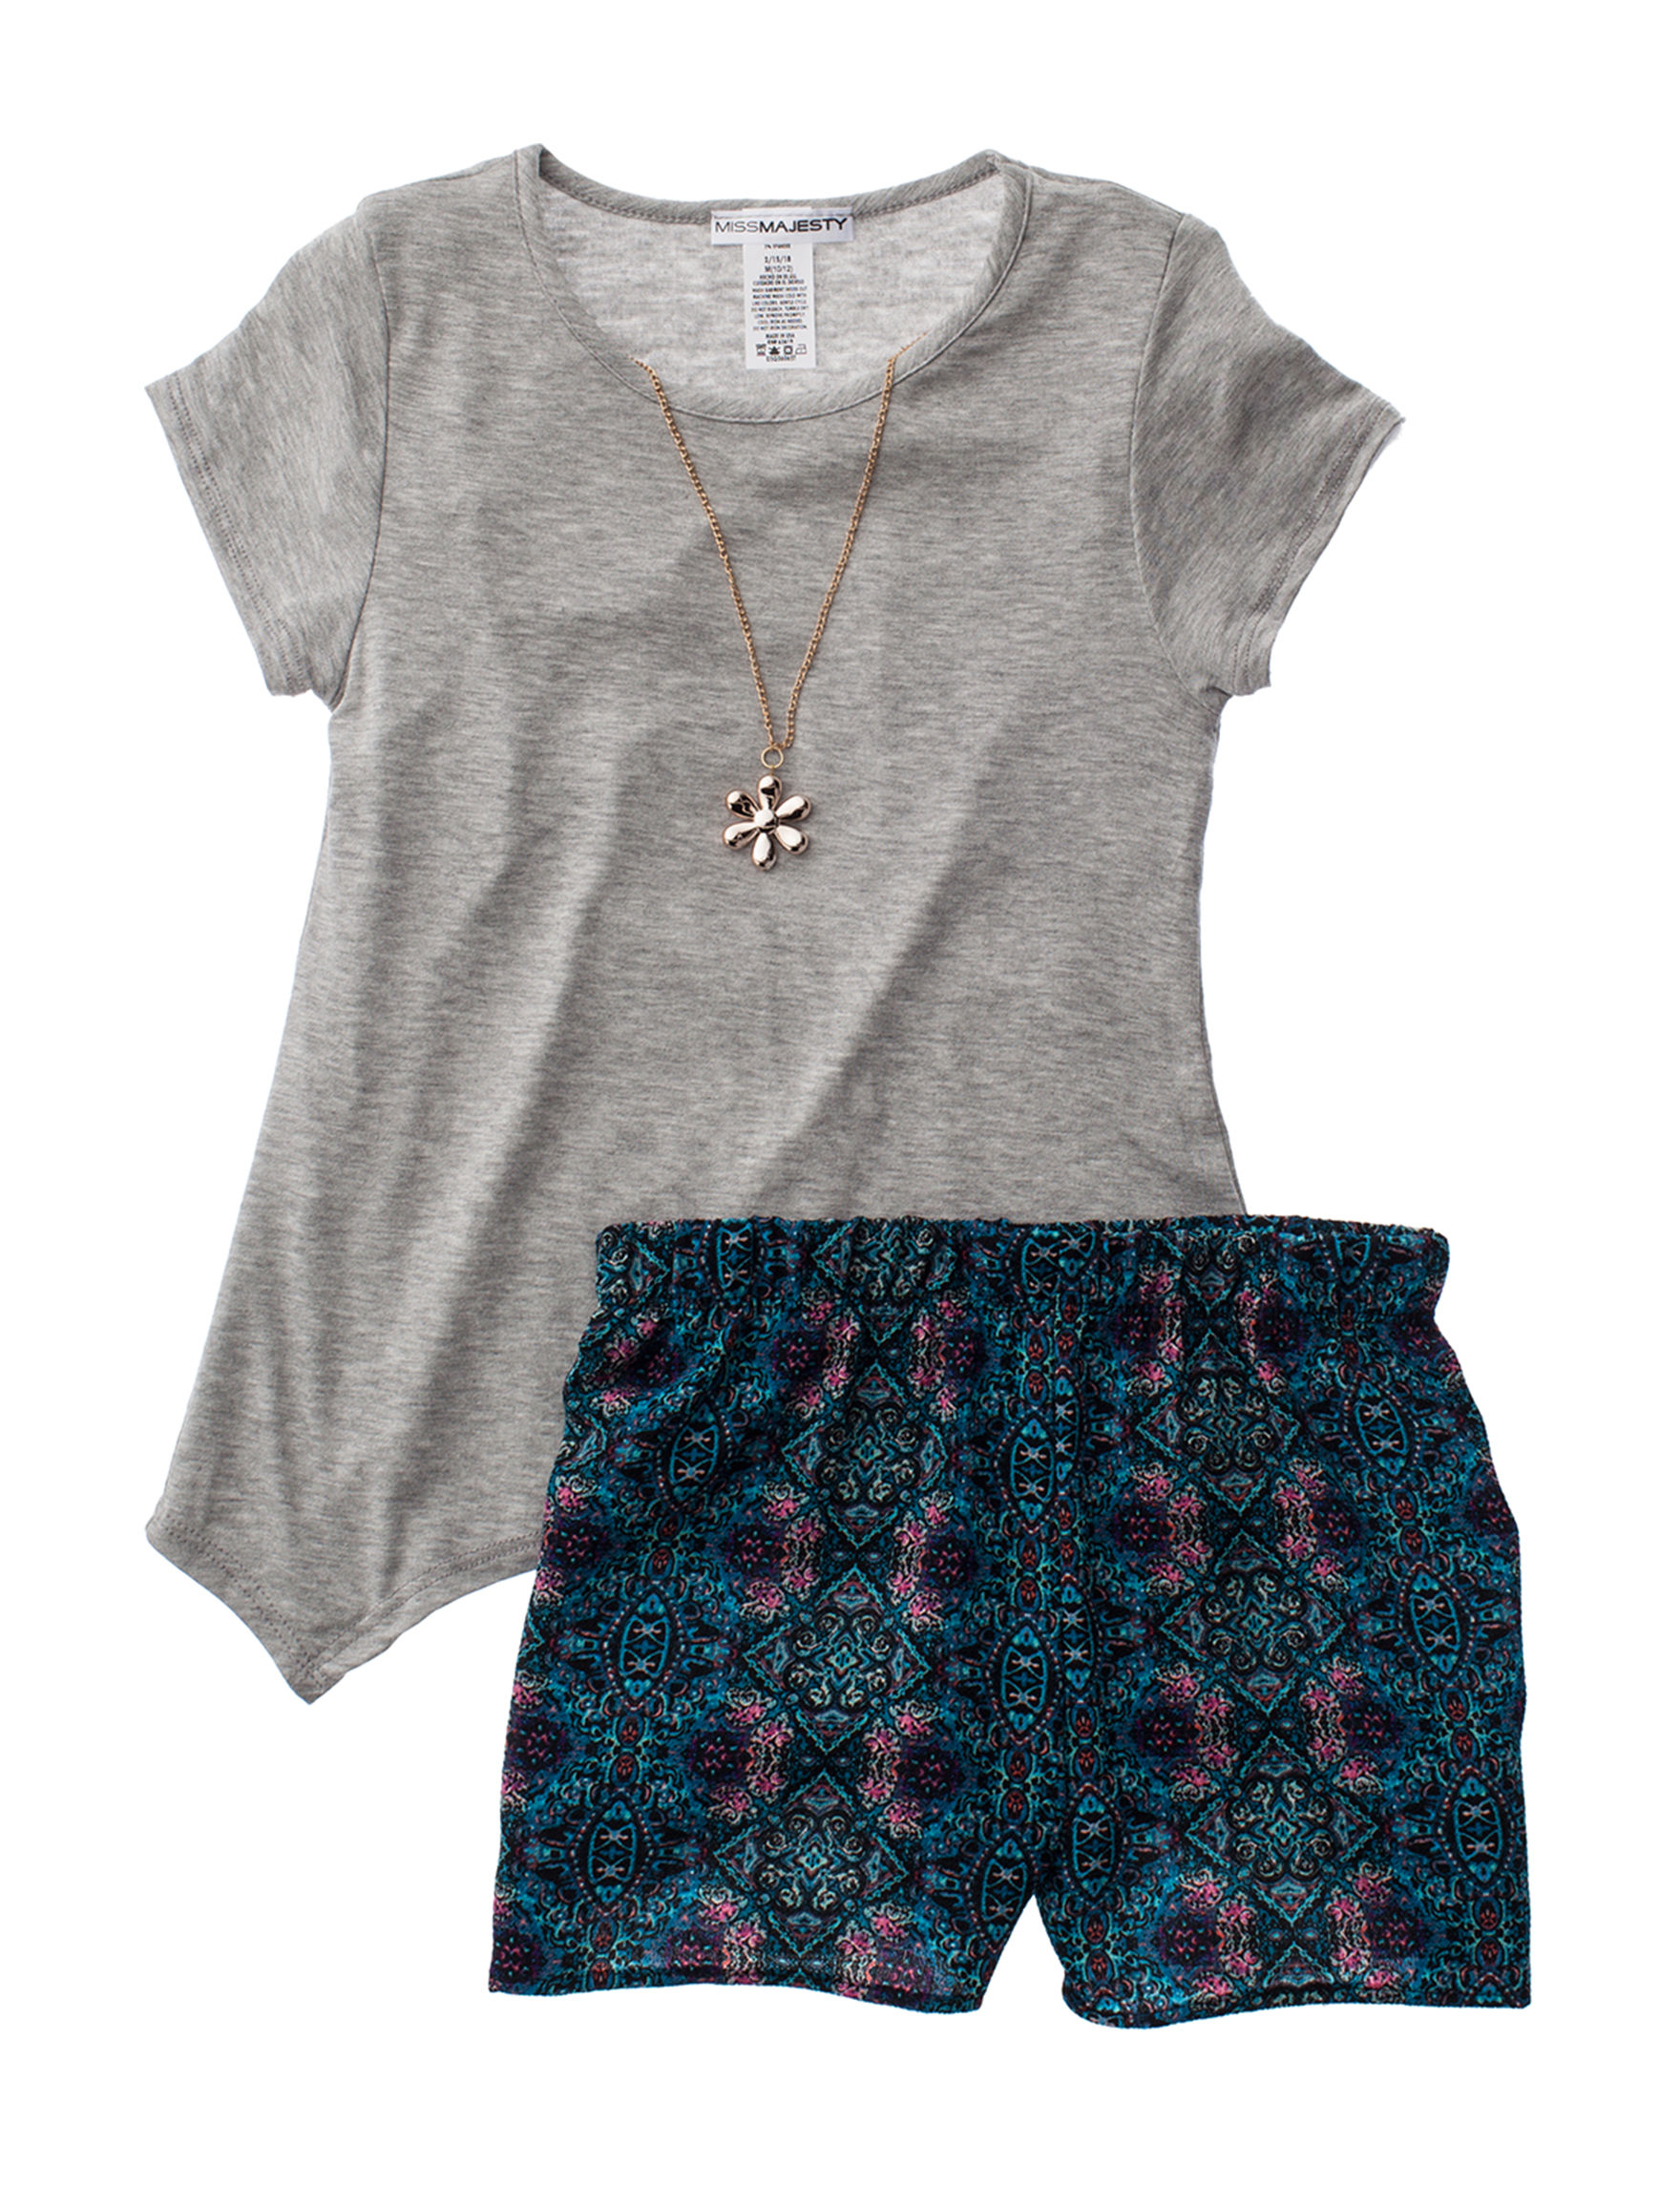 Miss Majesty Grey / Multi Soft Shorts